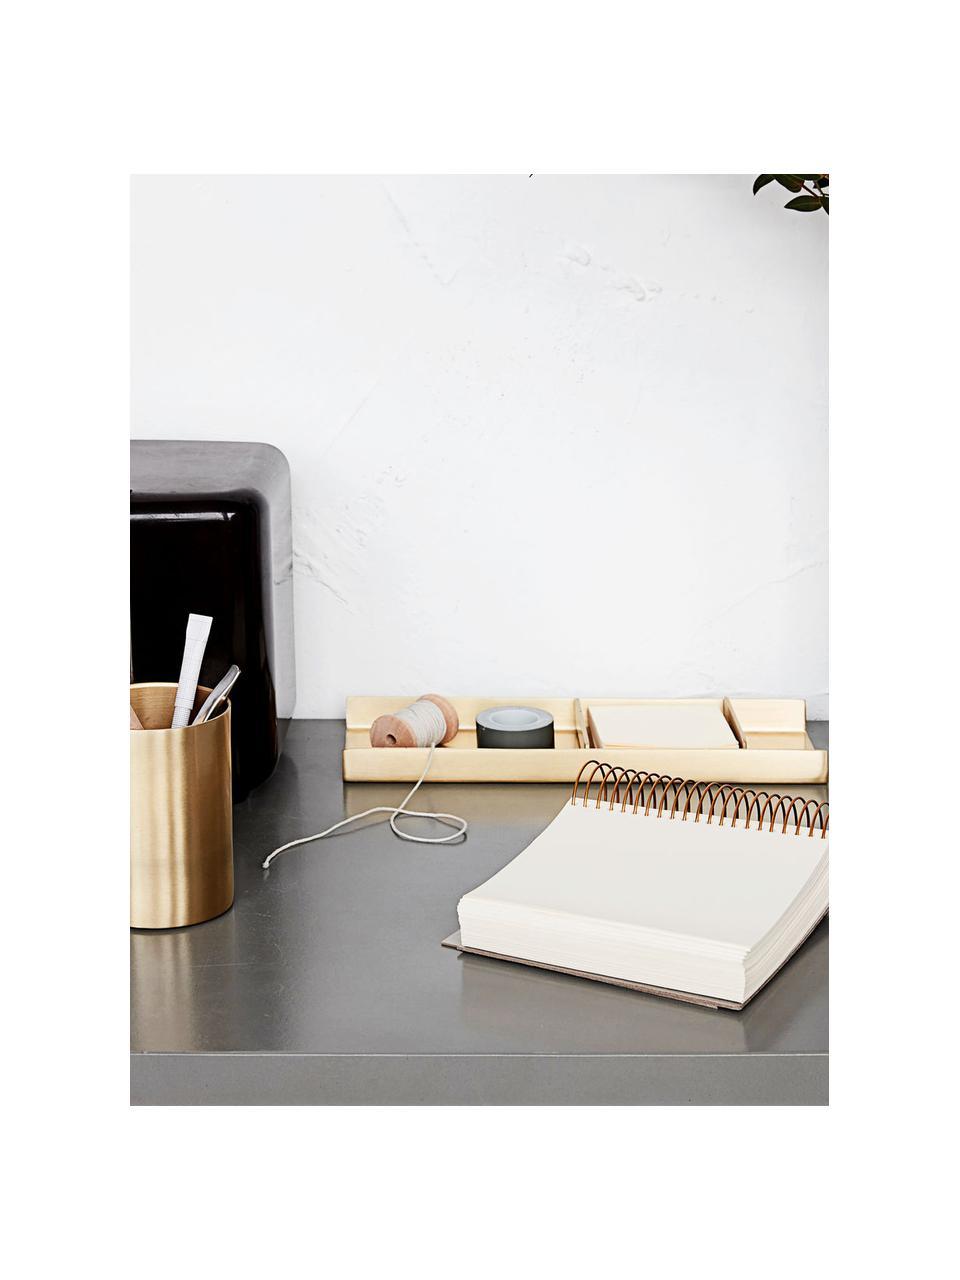 Bureau-organizerset Stationary, 3-delig, Metaal, Goudkleurig, 27 x 10 cm